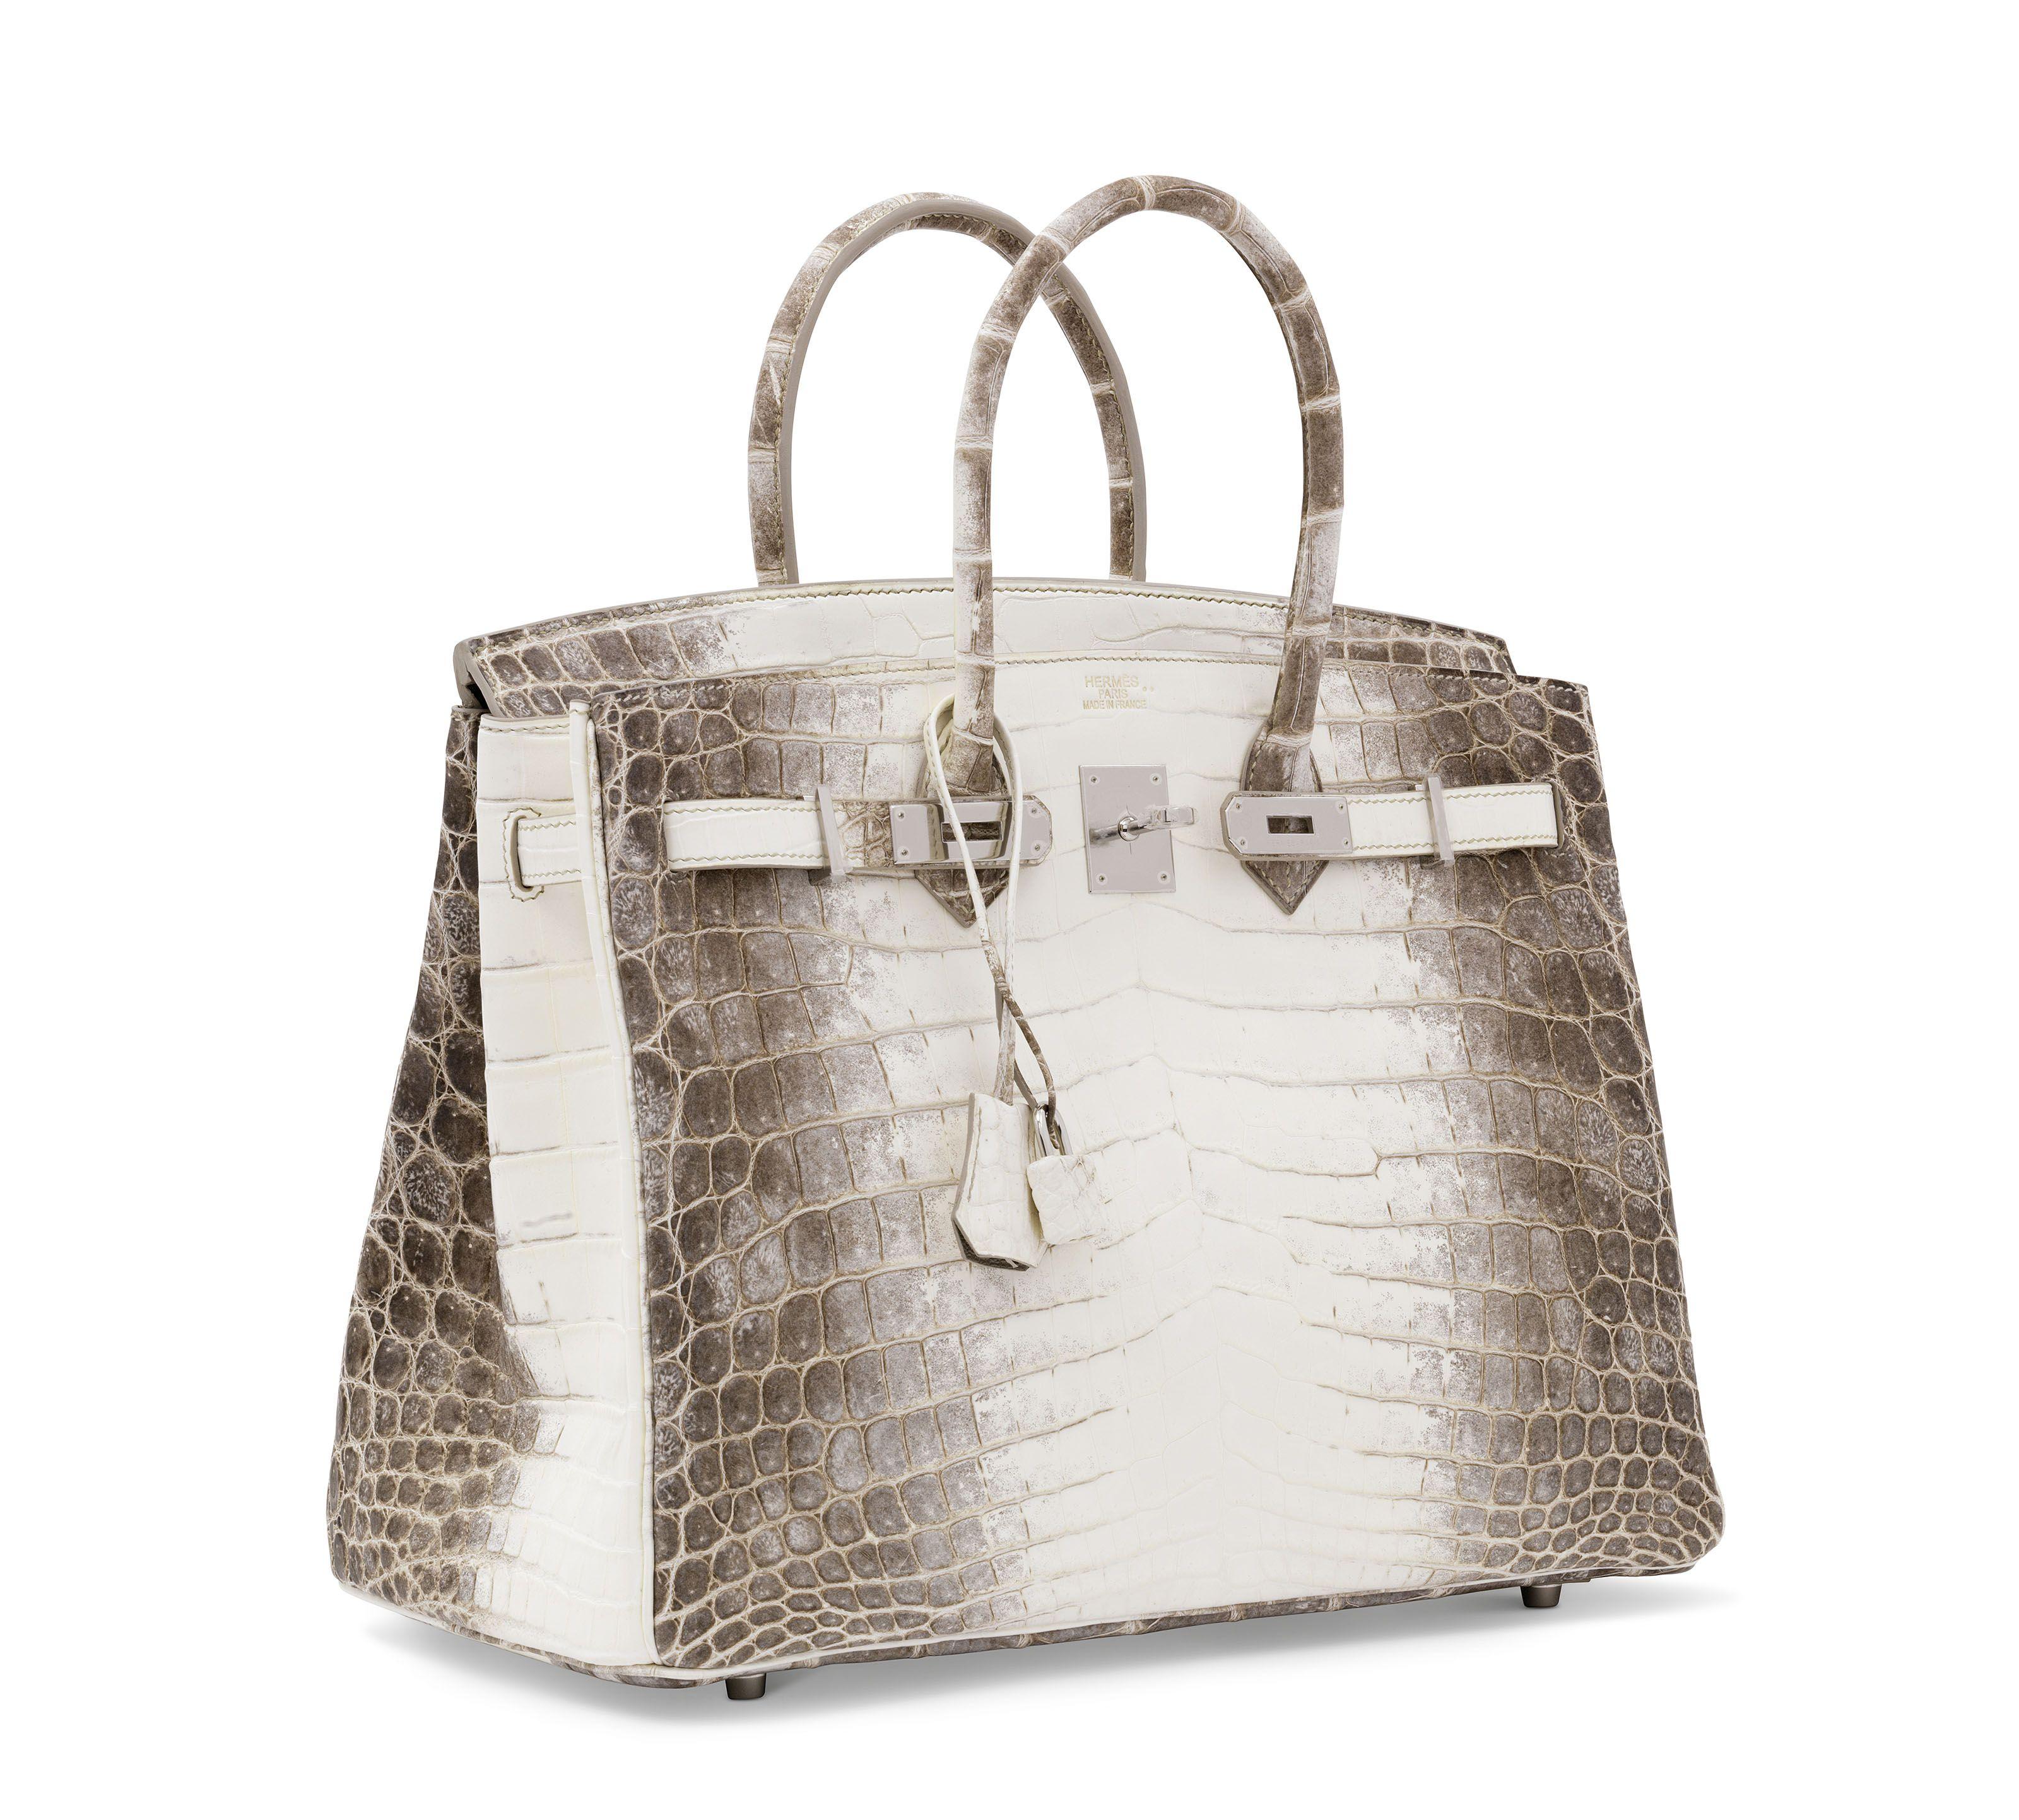 Hermes So-black Birkin Bag 30 Black Matte Alligator Crocodile Skin